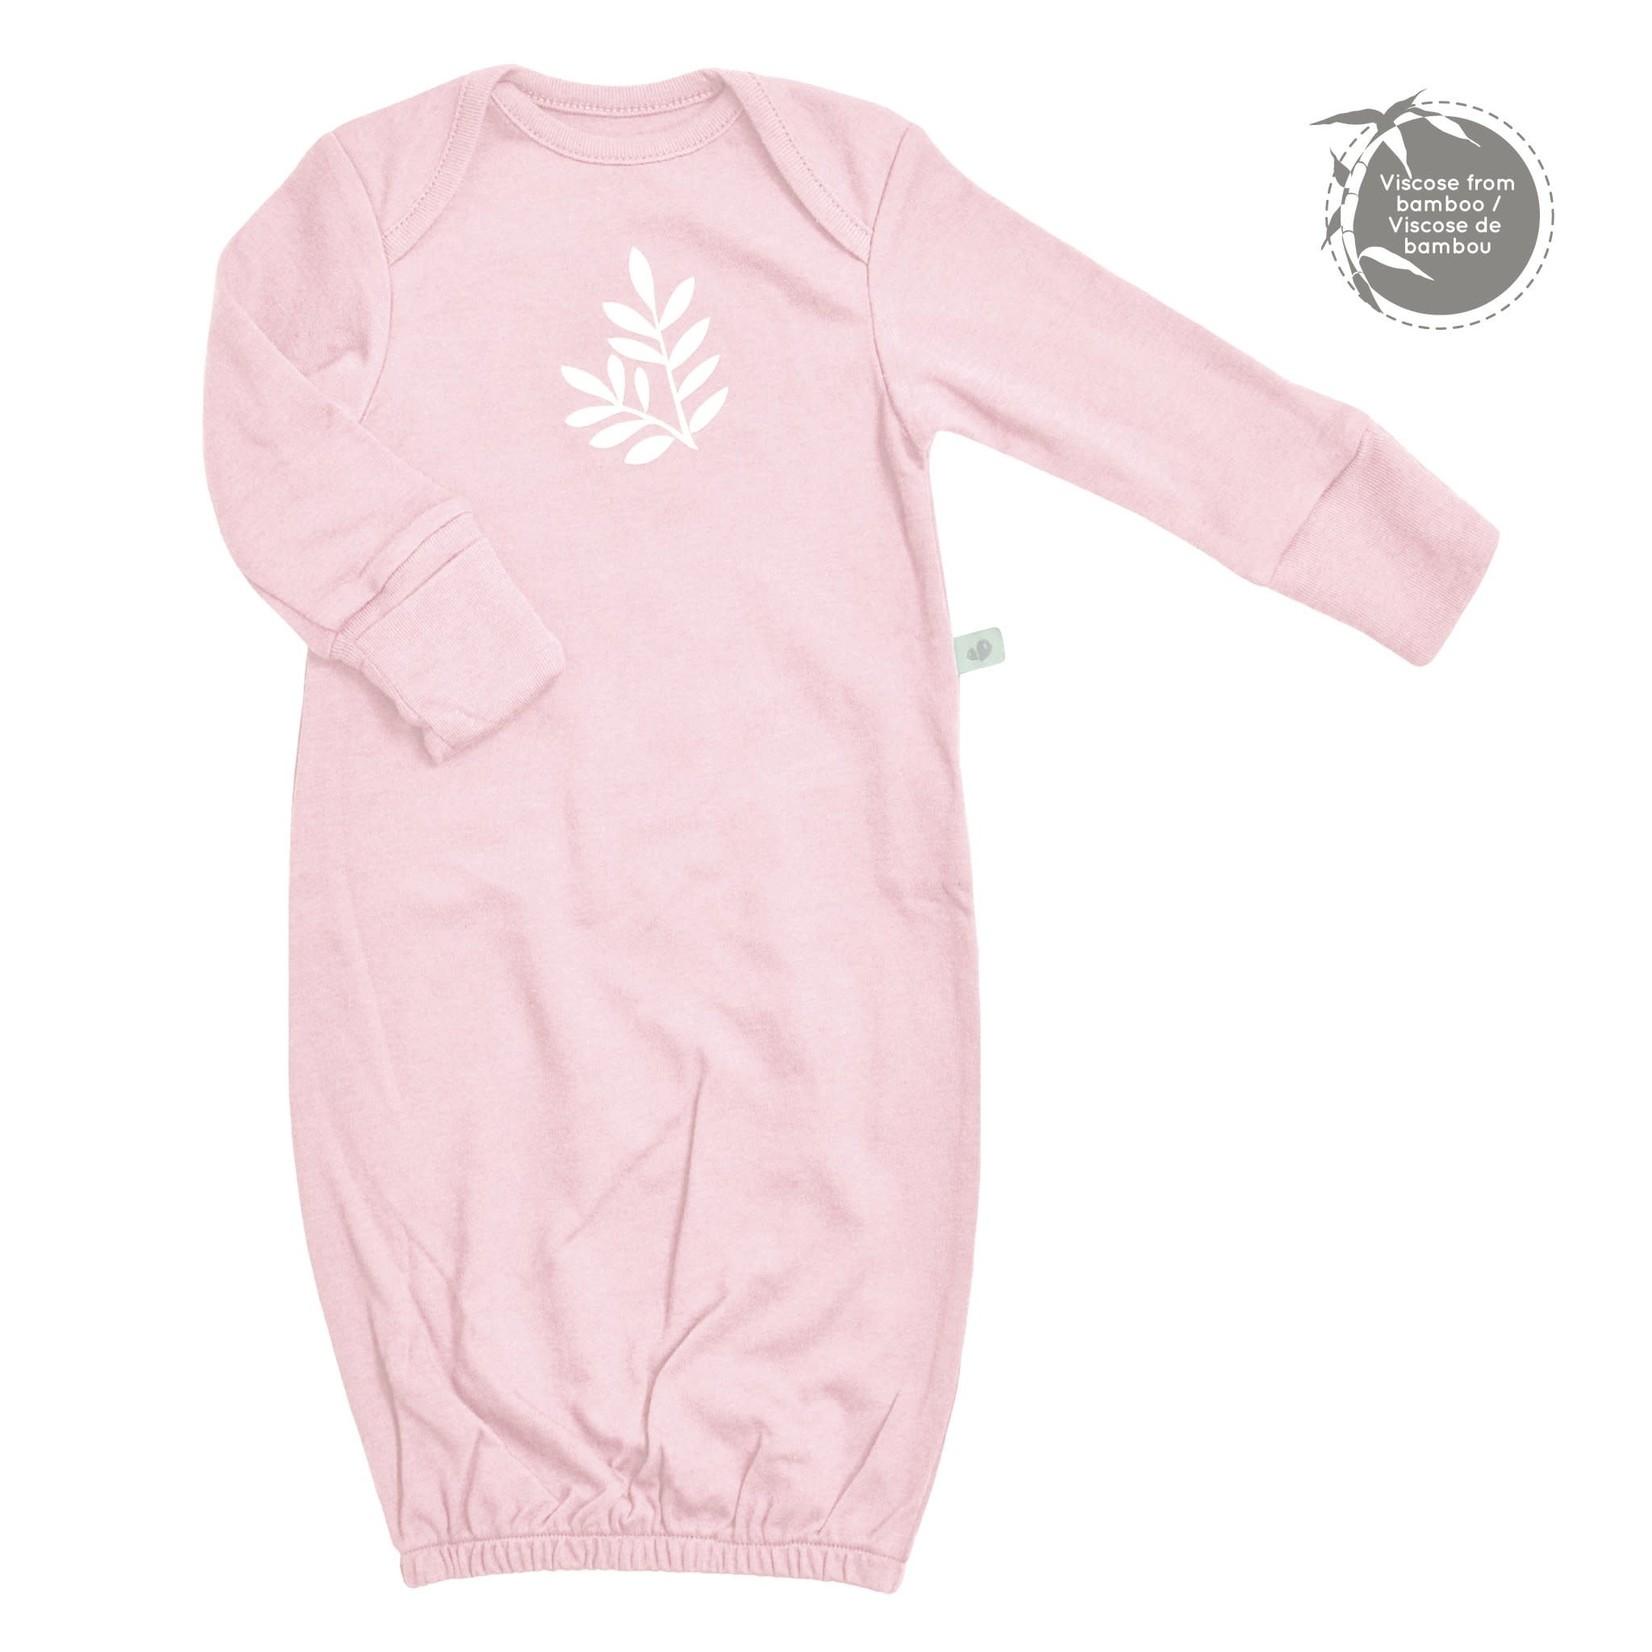 Bamboo Nightgown - Leaves - Light Pink - Newborn